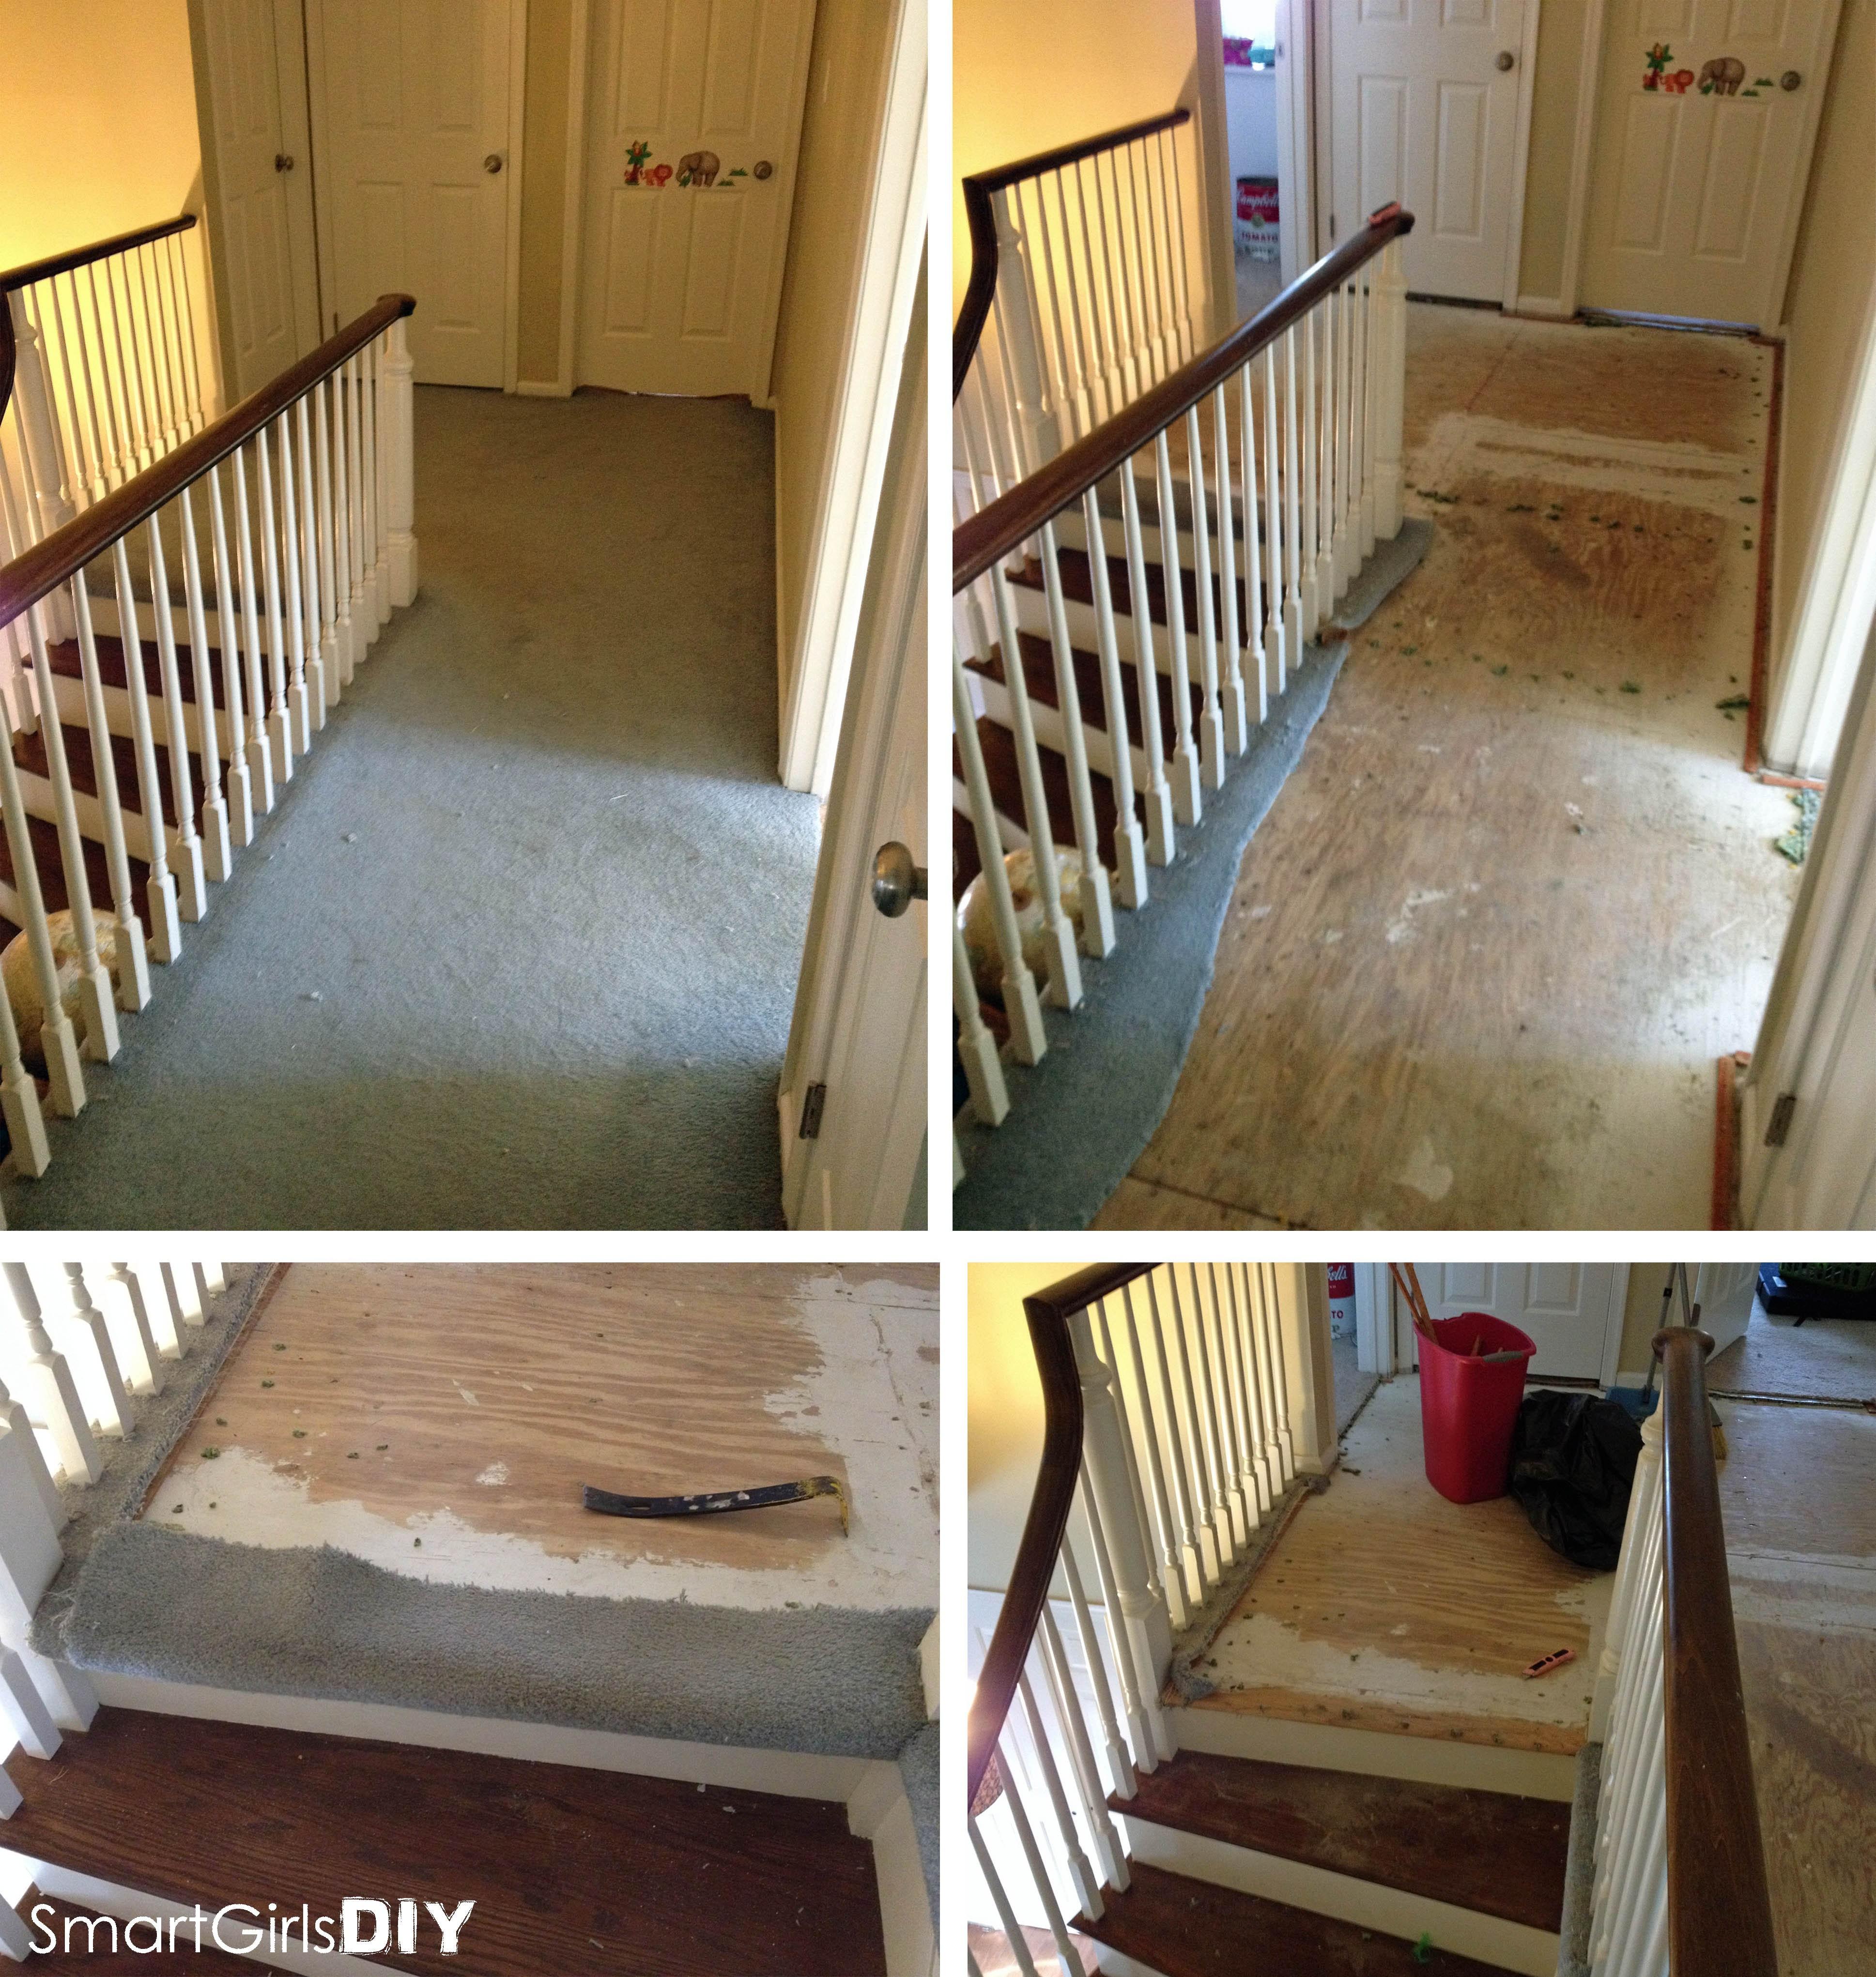 hardwood floor direction hallway of upstairs hallway 1 installing hardwood floors with regard to removing carpet from hallway installing the hardwood floor